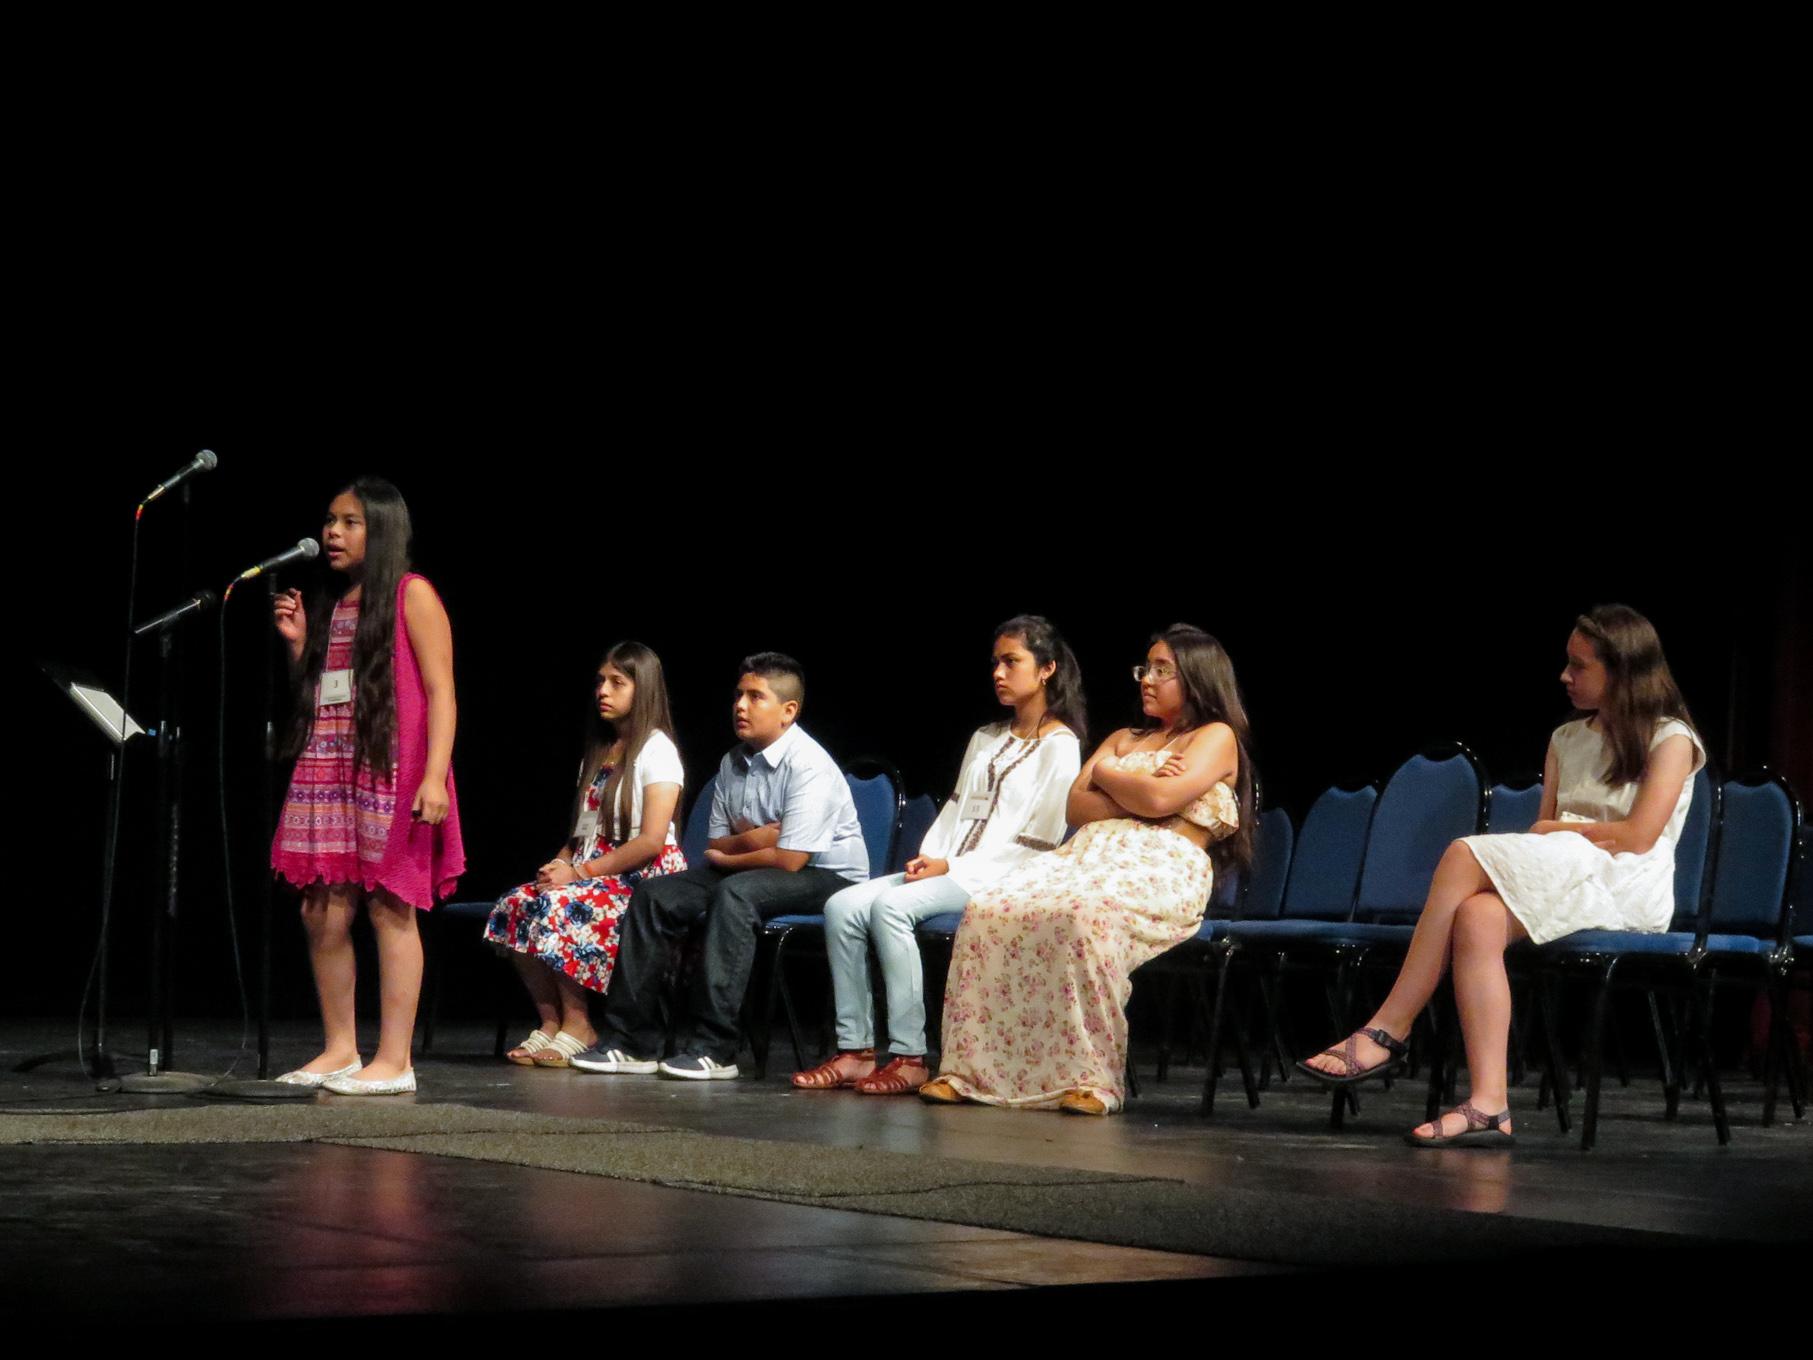 Kiara Rivas Vasquez enunciates a word for the judges. Photo by Rocio Guenther.